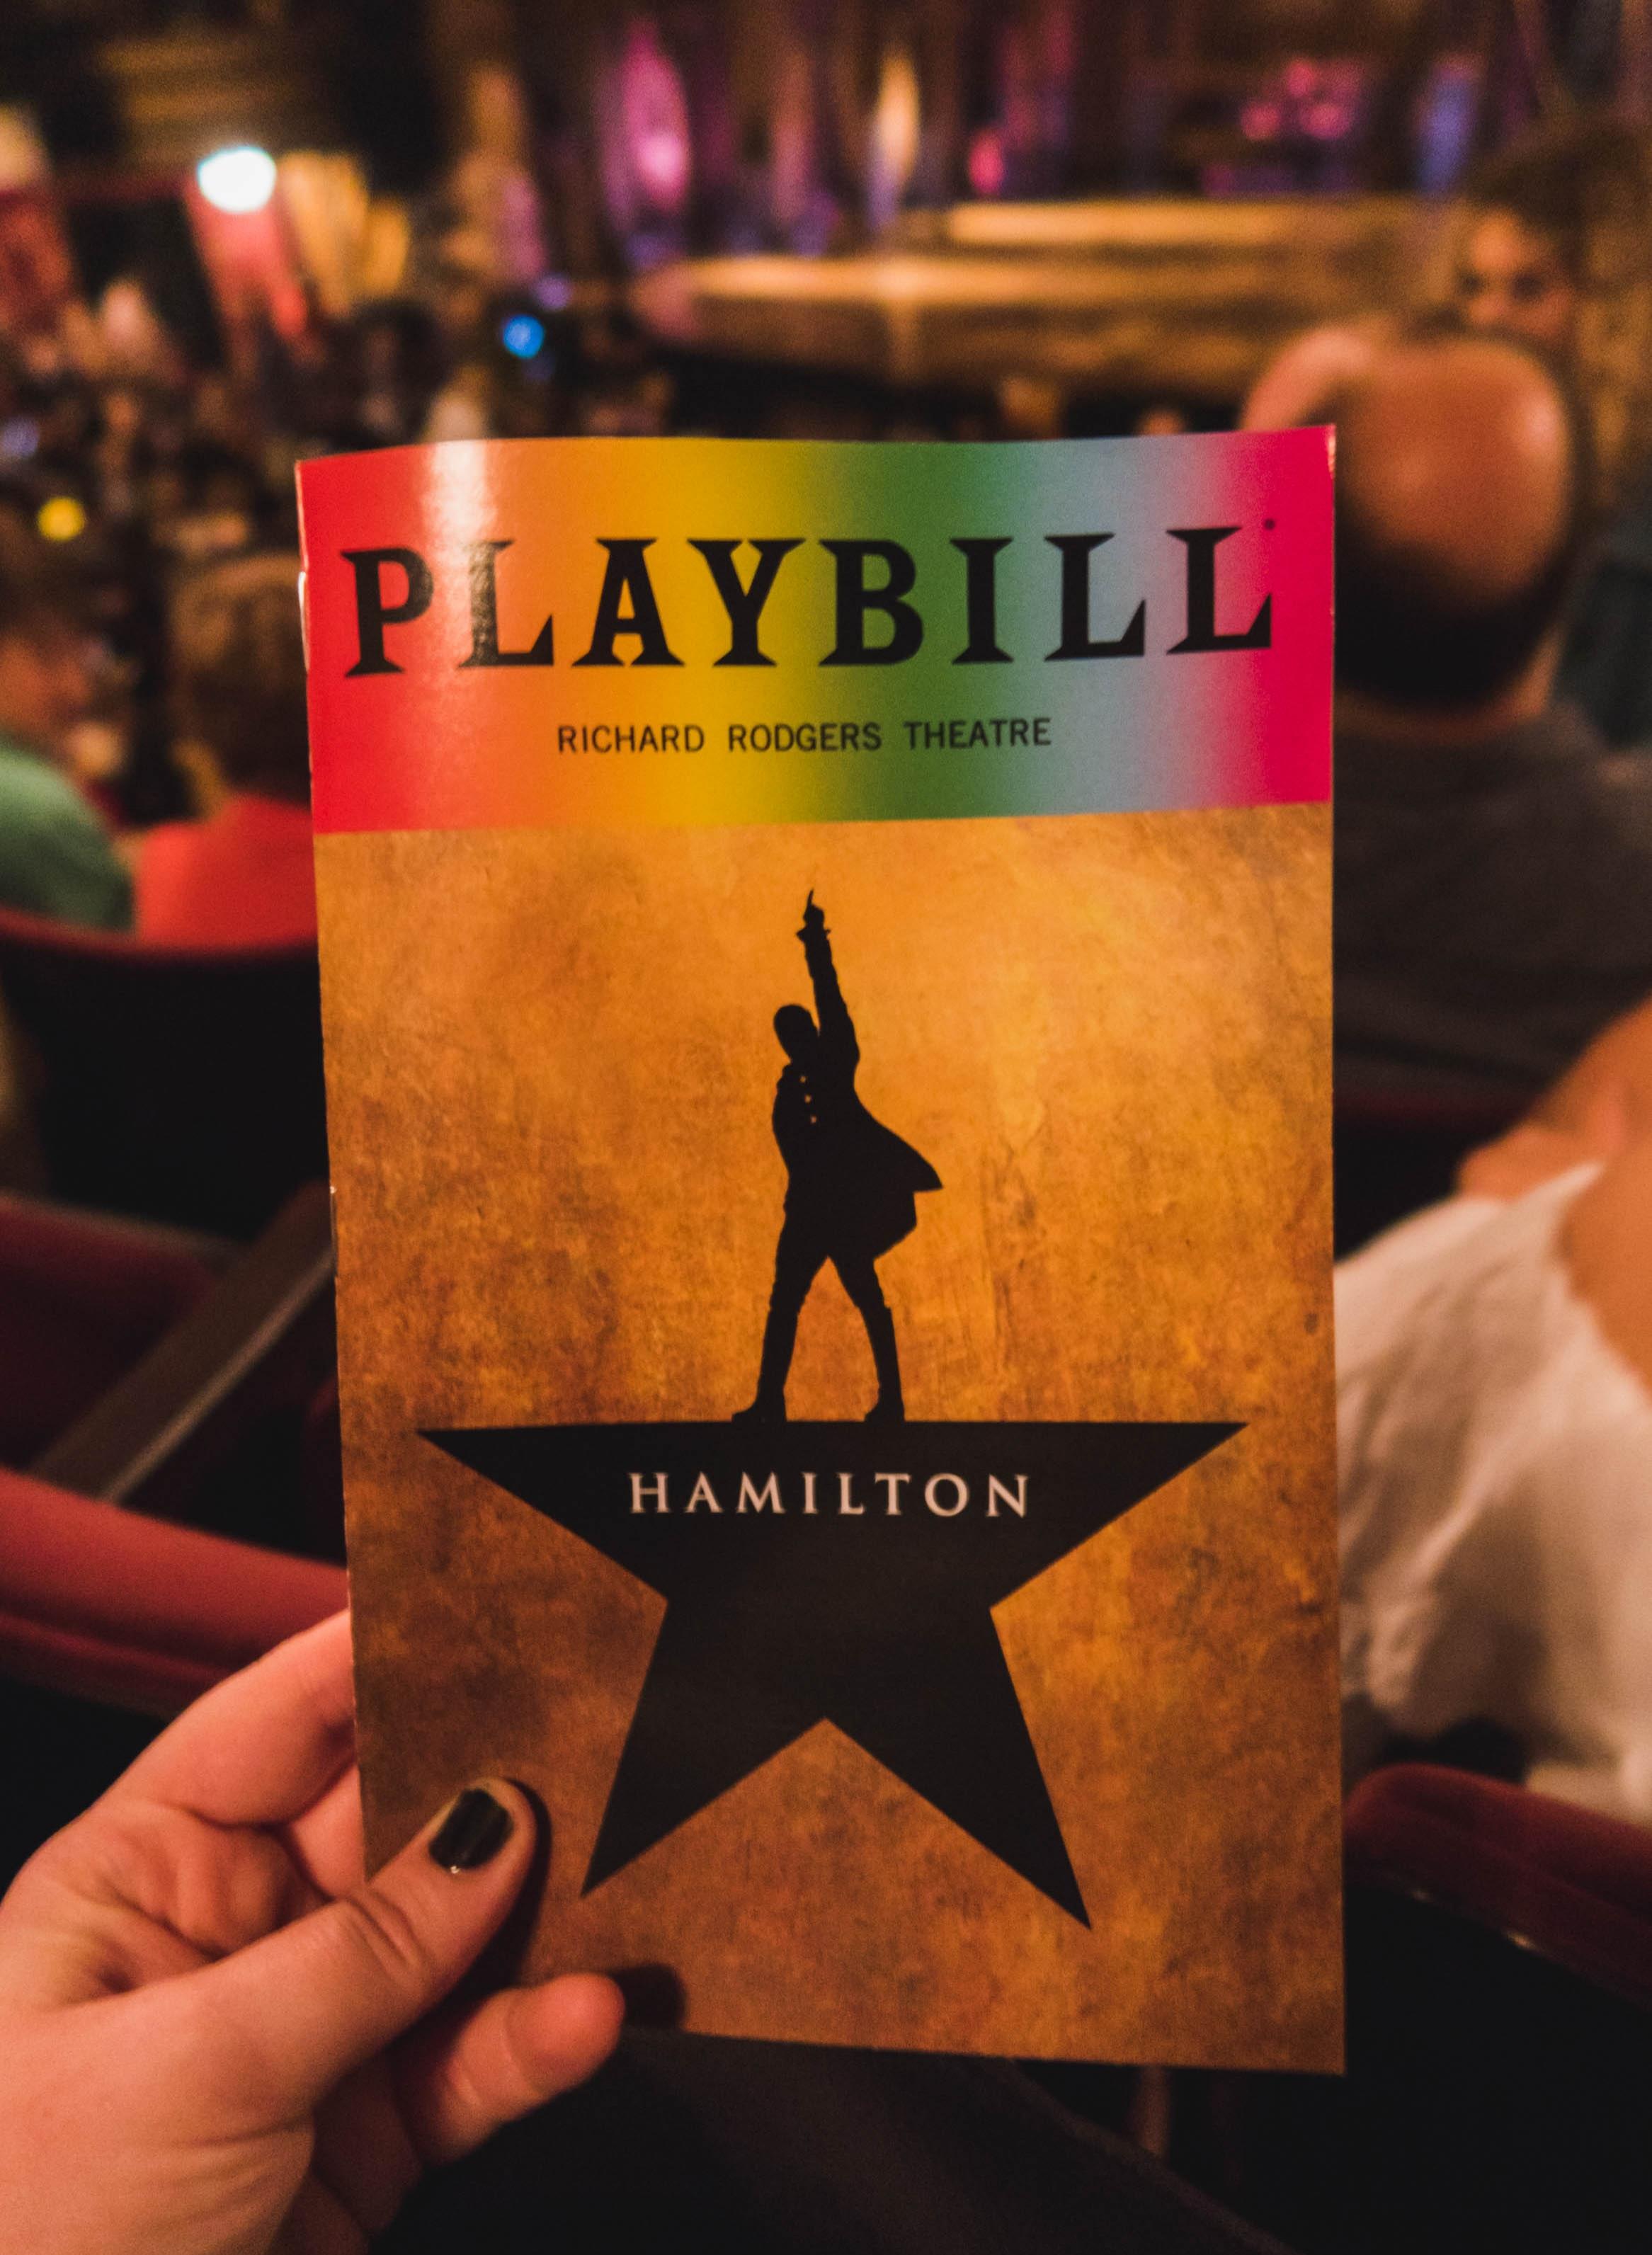 hamilton-broadway-new-york-playbill